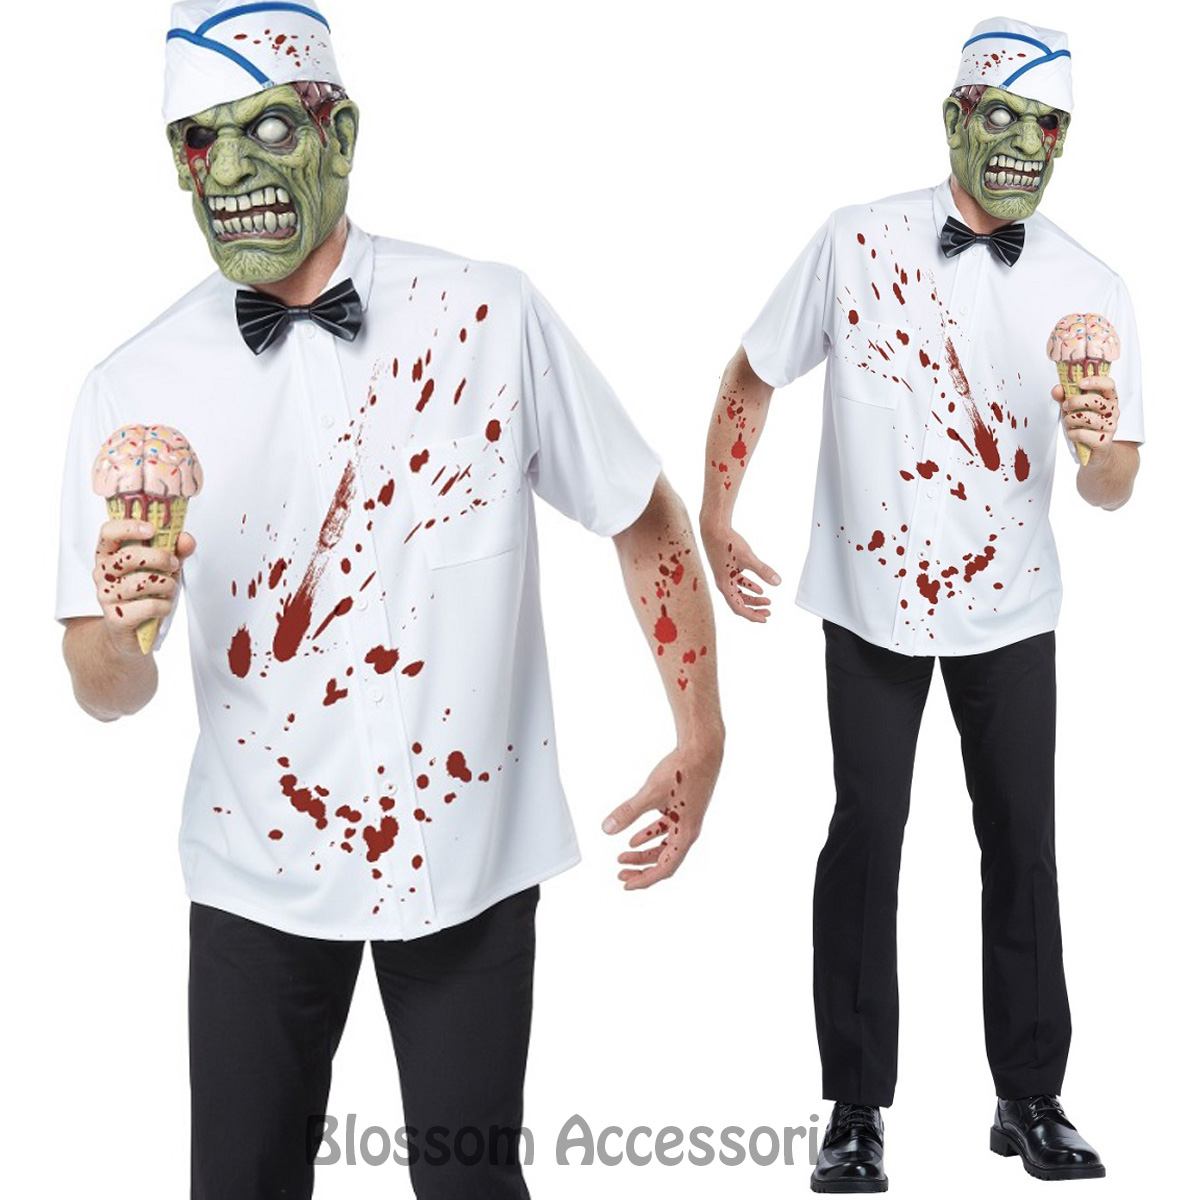 ca107 i scream man adult costume halloween zombie killer monster